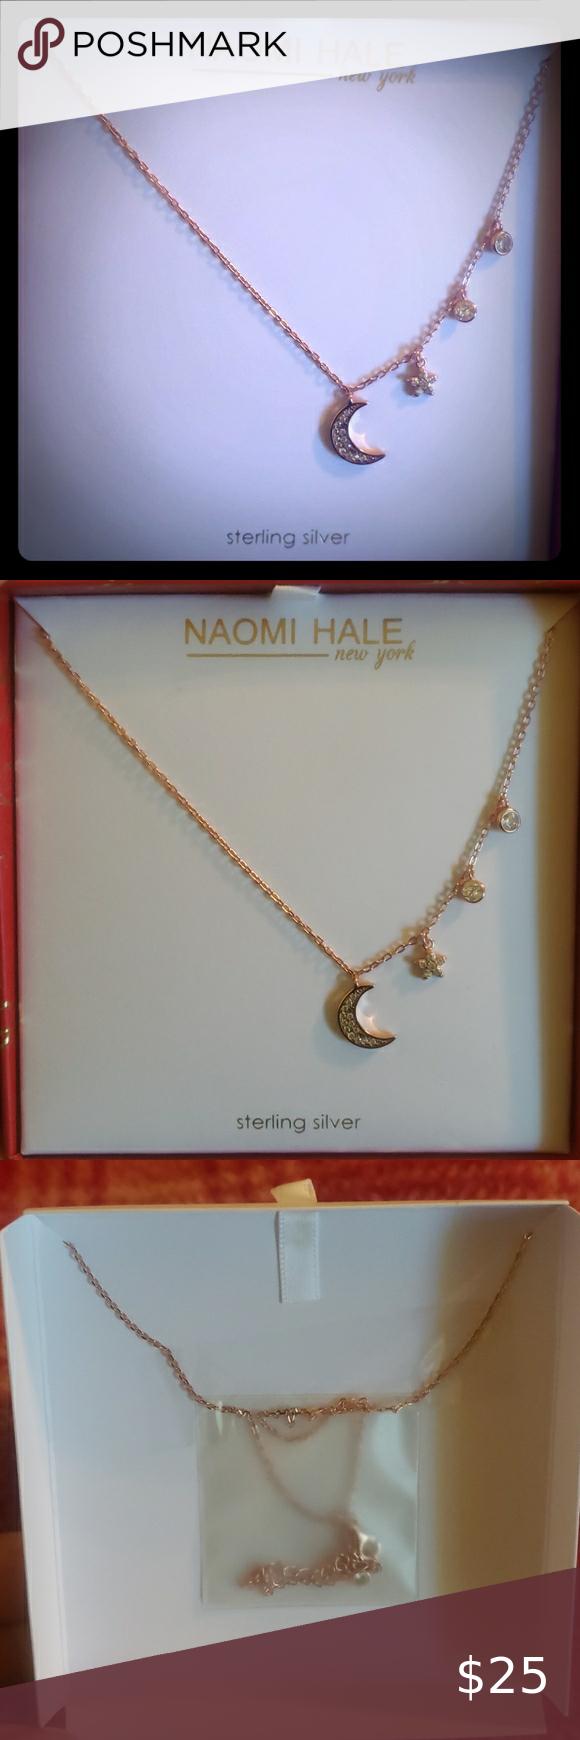 17++ Naomi hale new york jewelry info